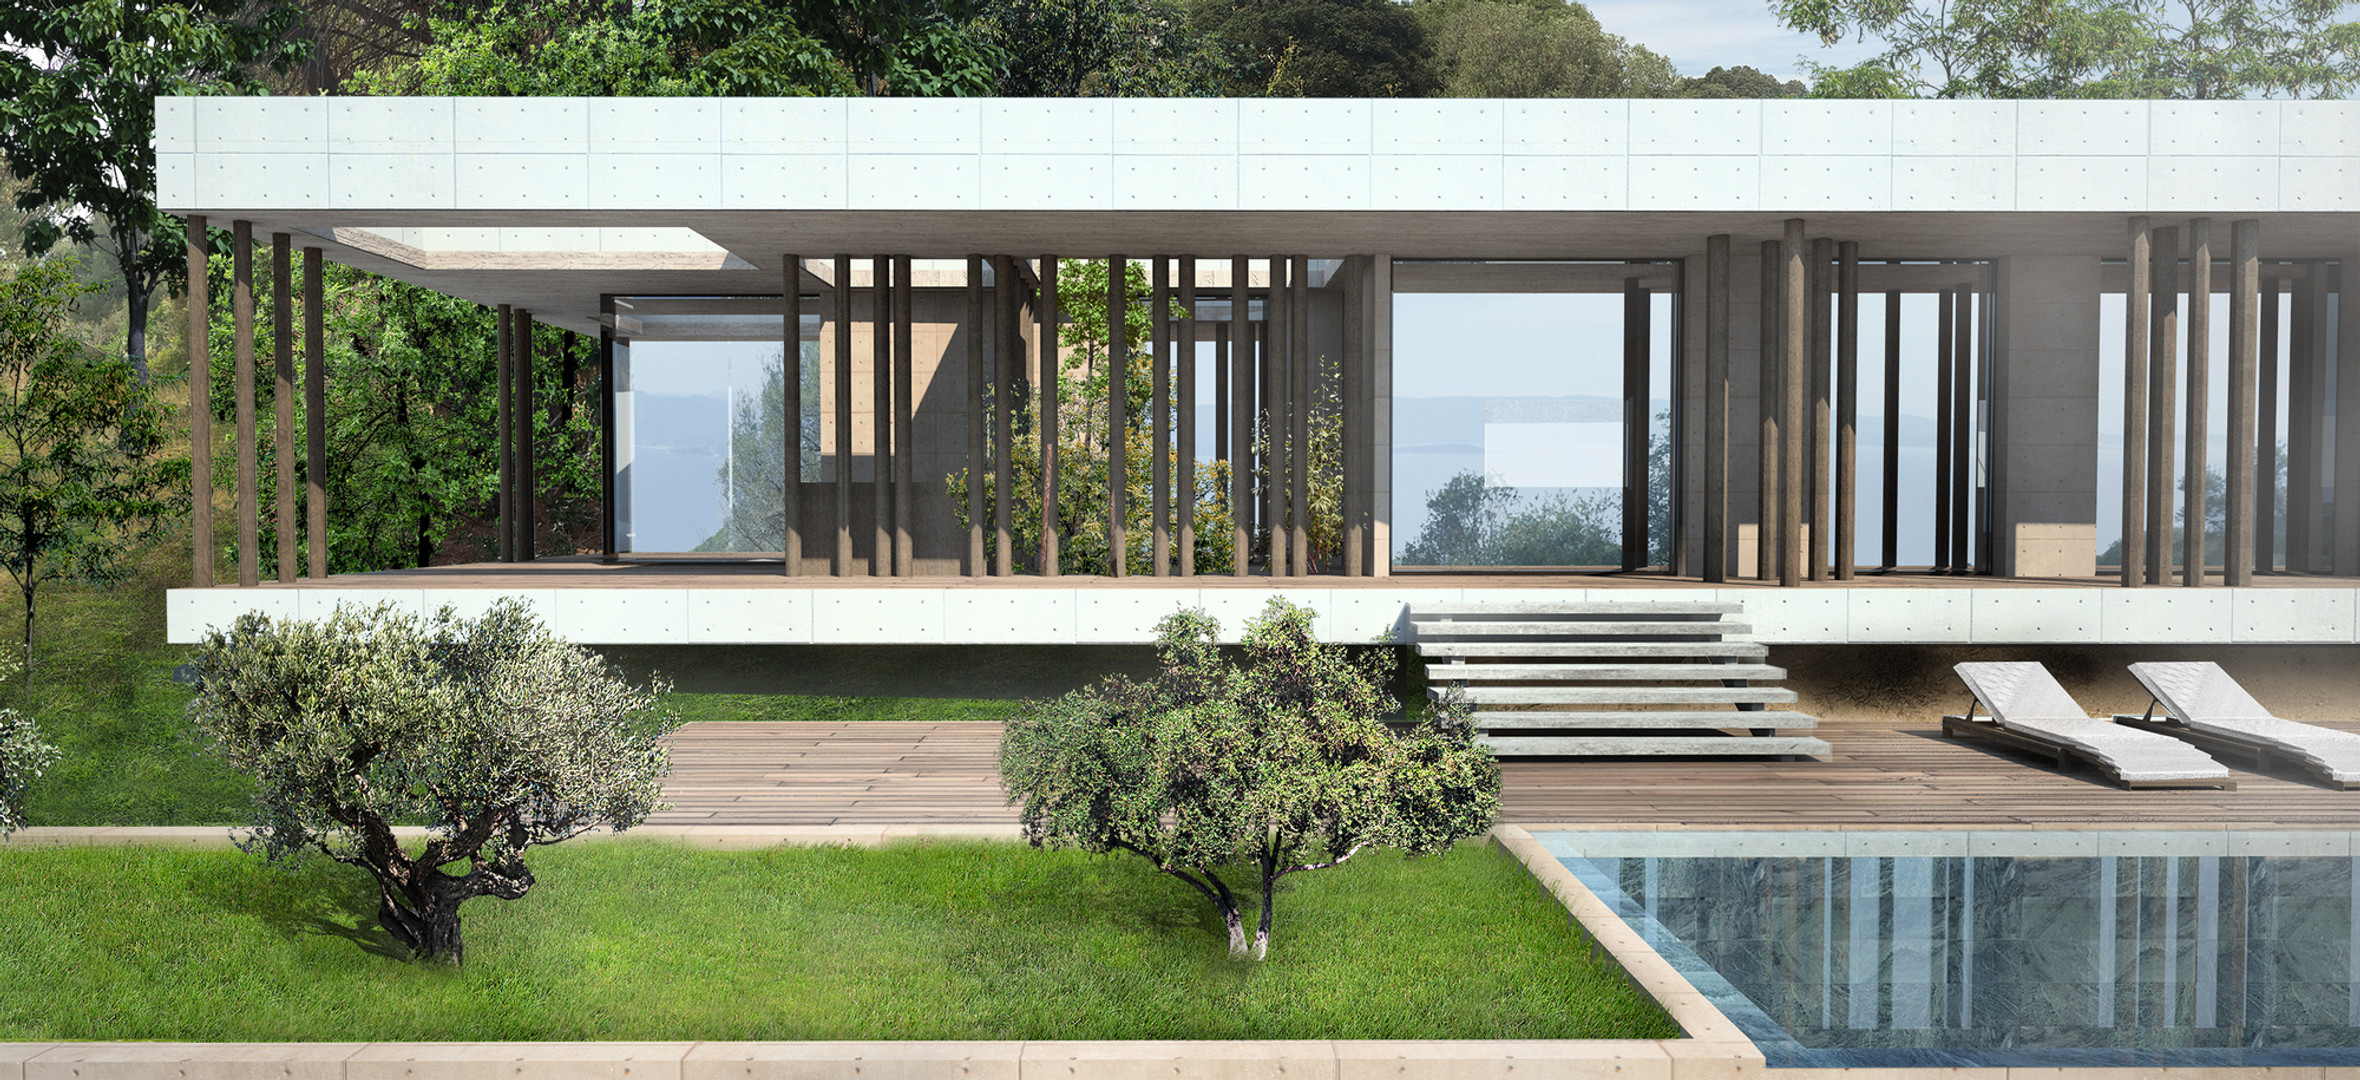 Maison_lena_pantalacci_architecte_corse_01.jpg